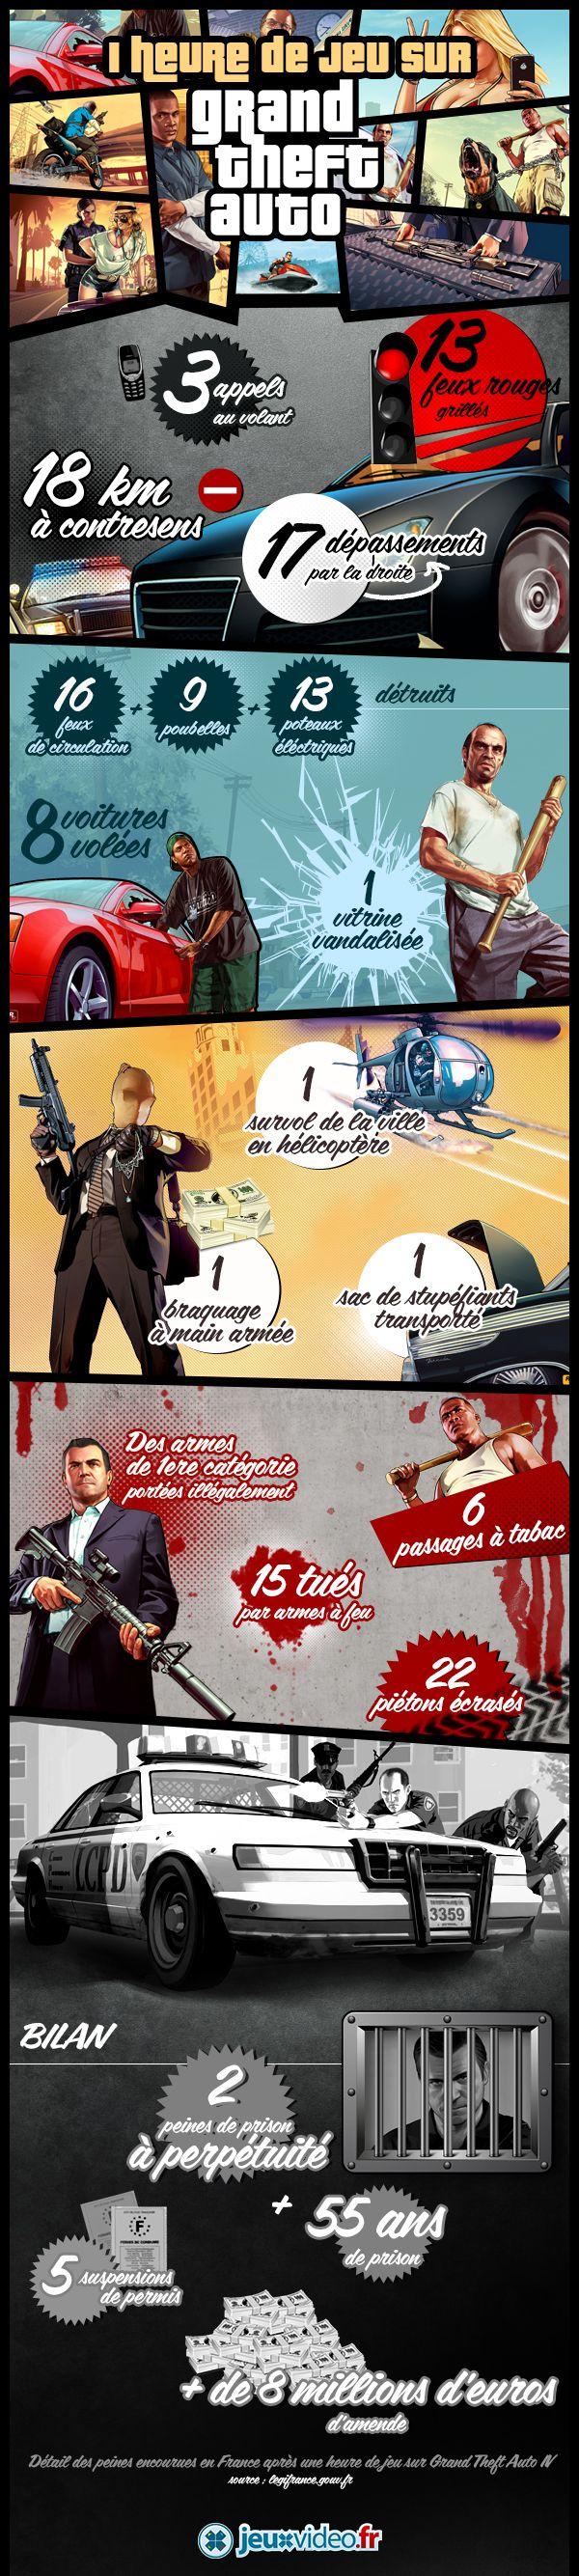 infographie-gta-5-vraie-vie